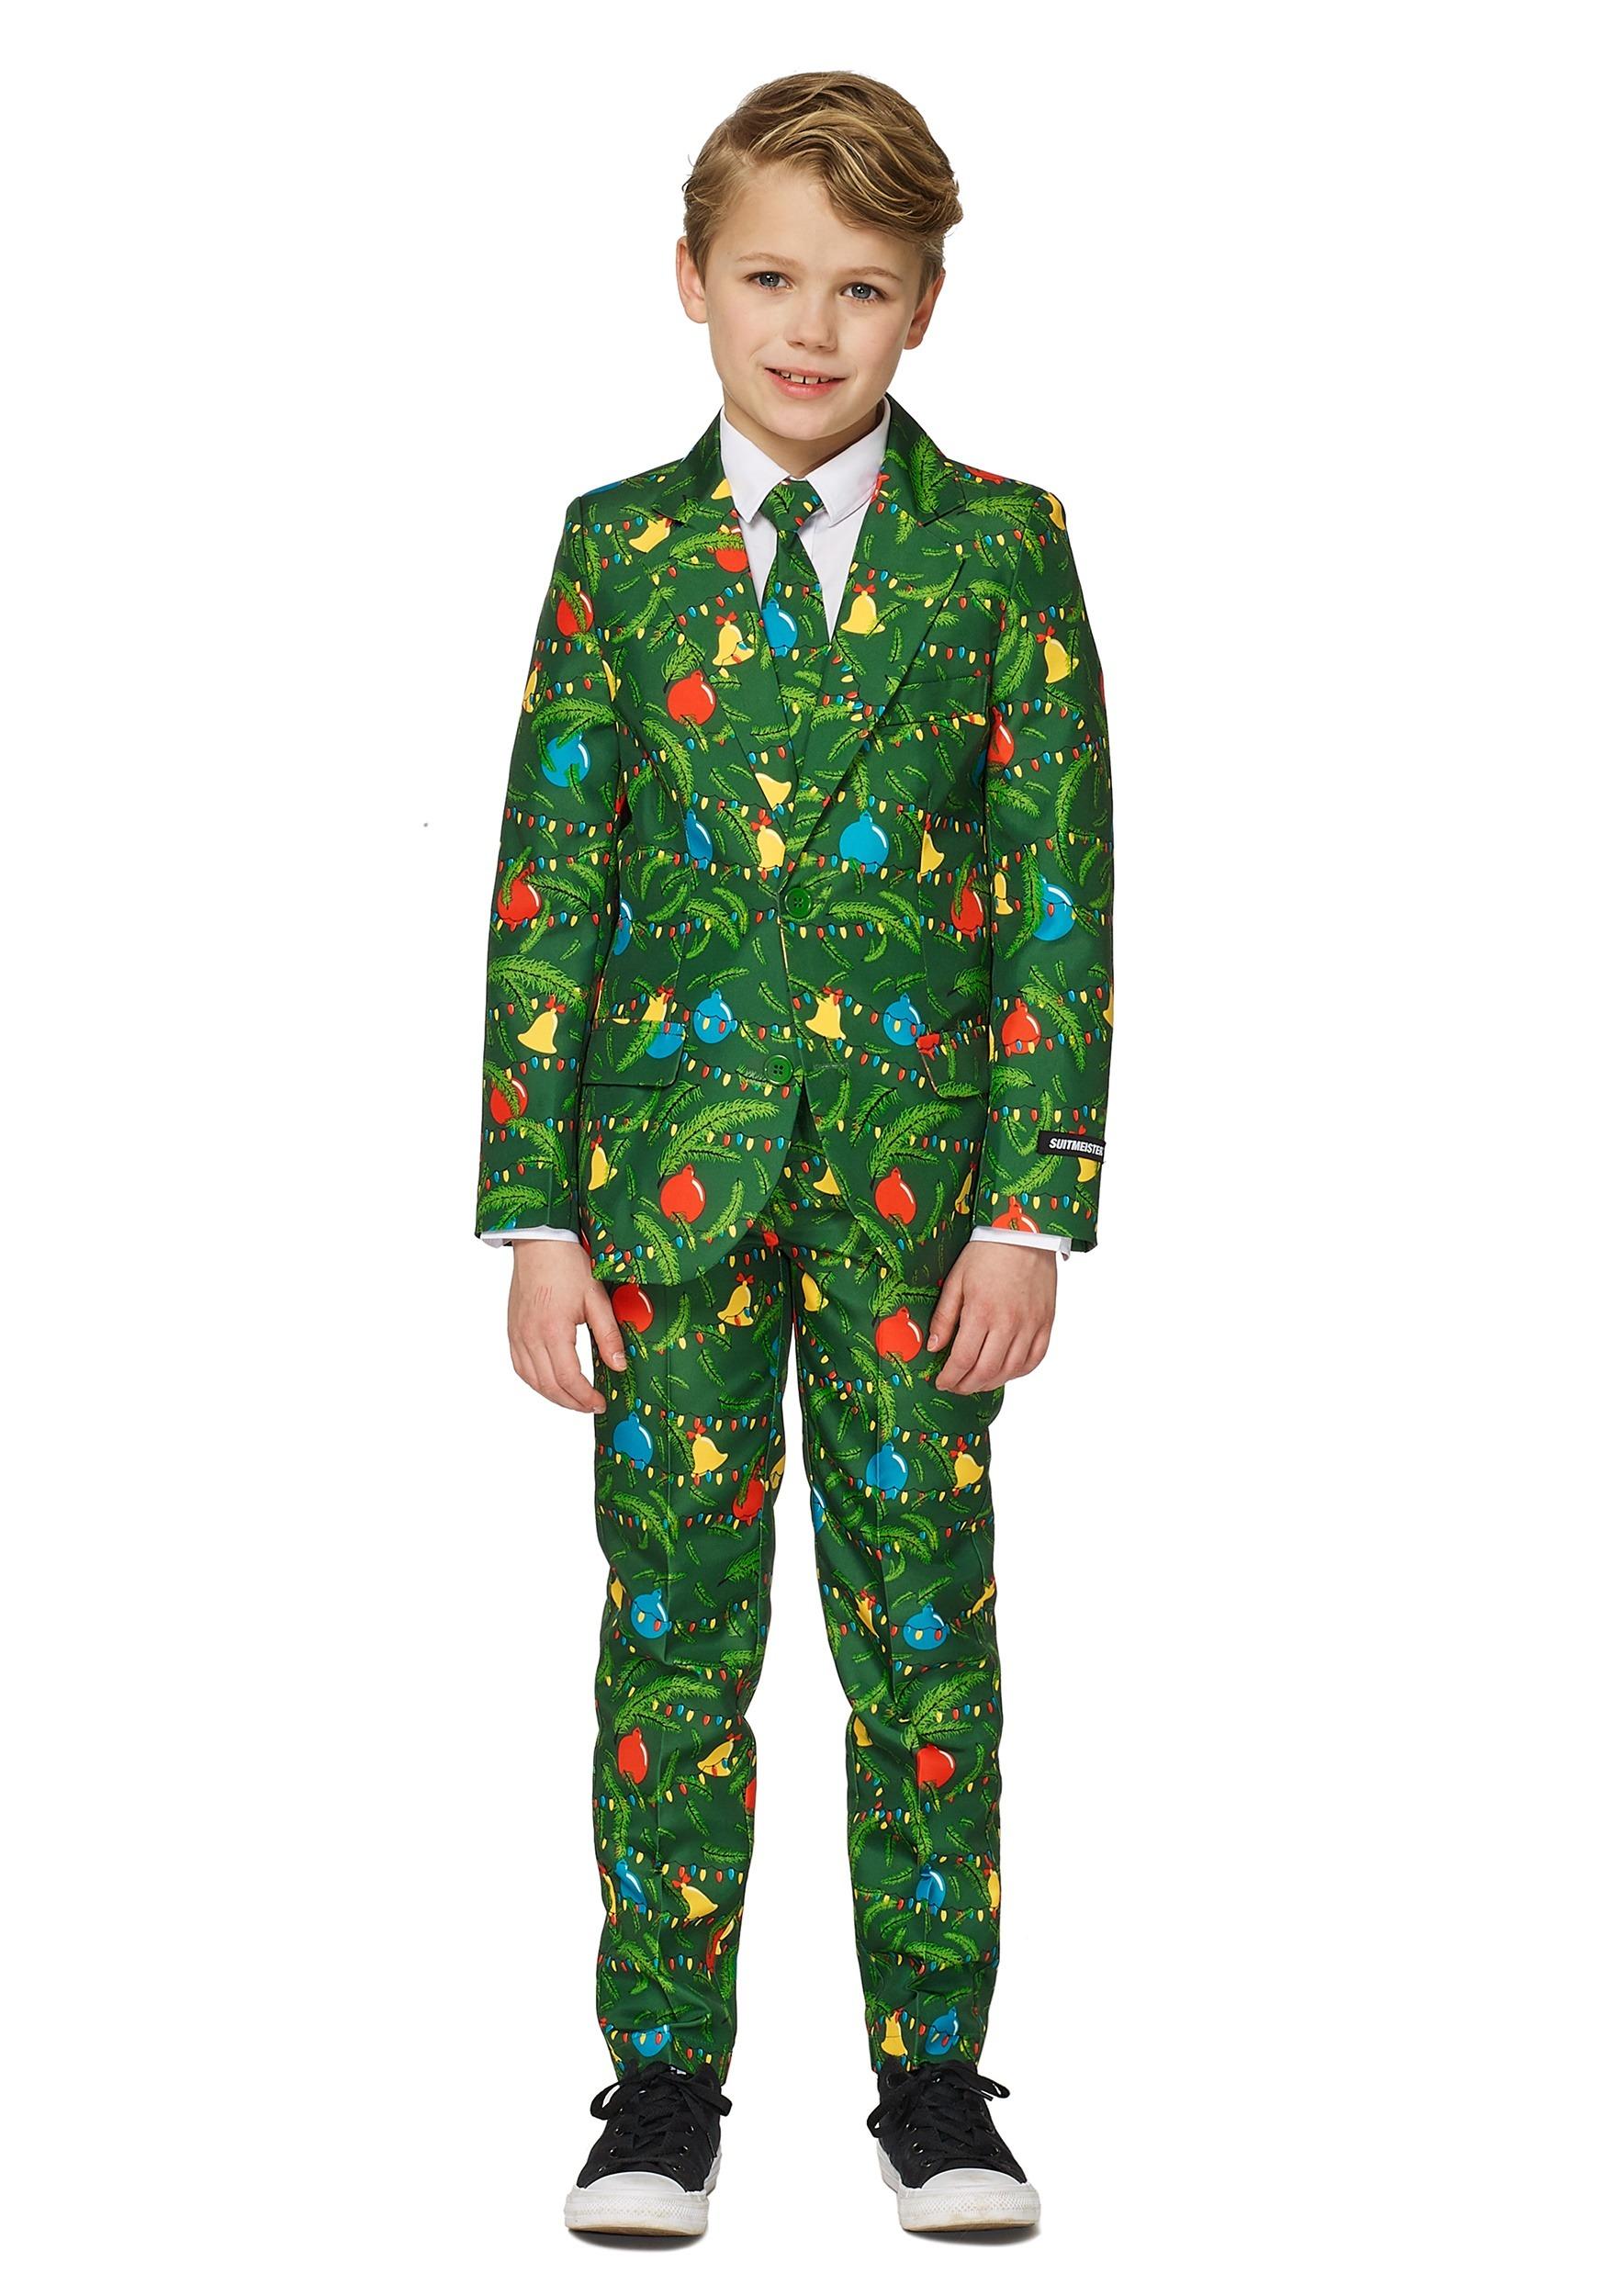 Green Boys Christmas Tree Suitmeister